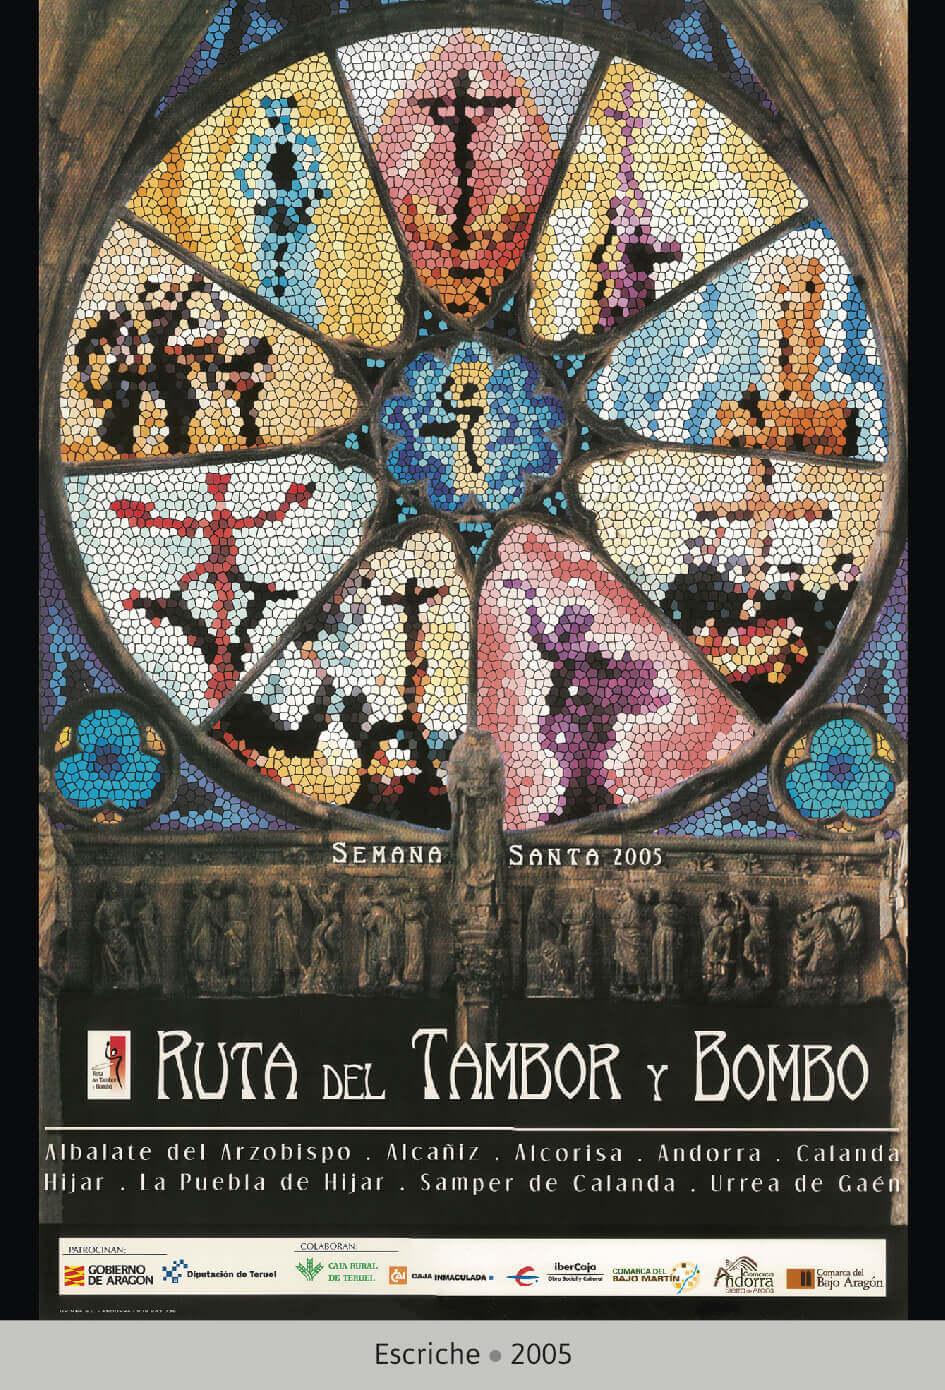 Cartel Ganador Ruta del Tambor y Bombo. Semana Santa 2005